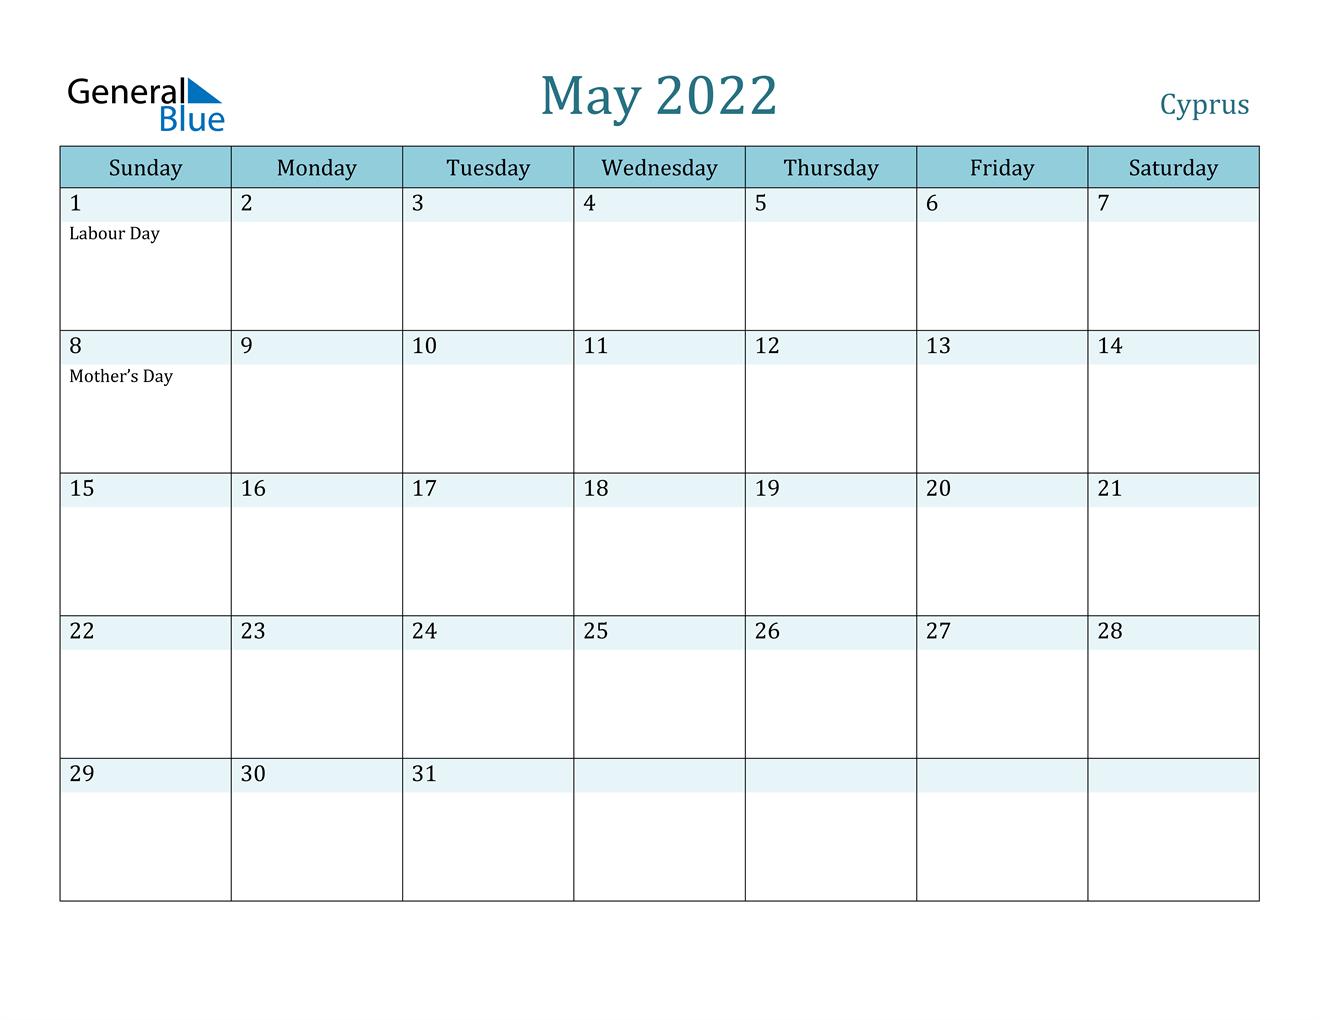 May 2022 Calendar - Cyprus